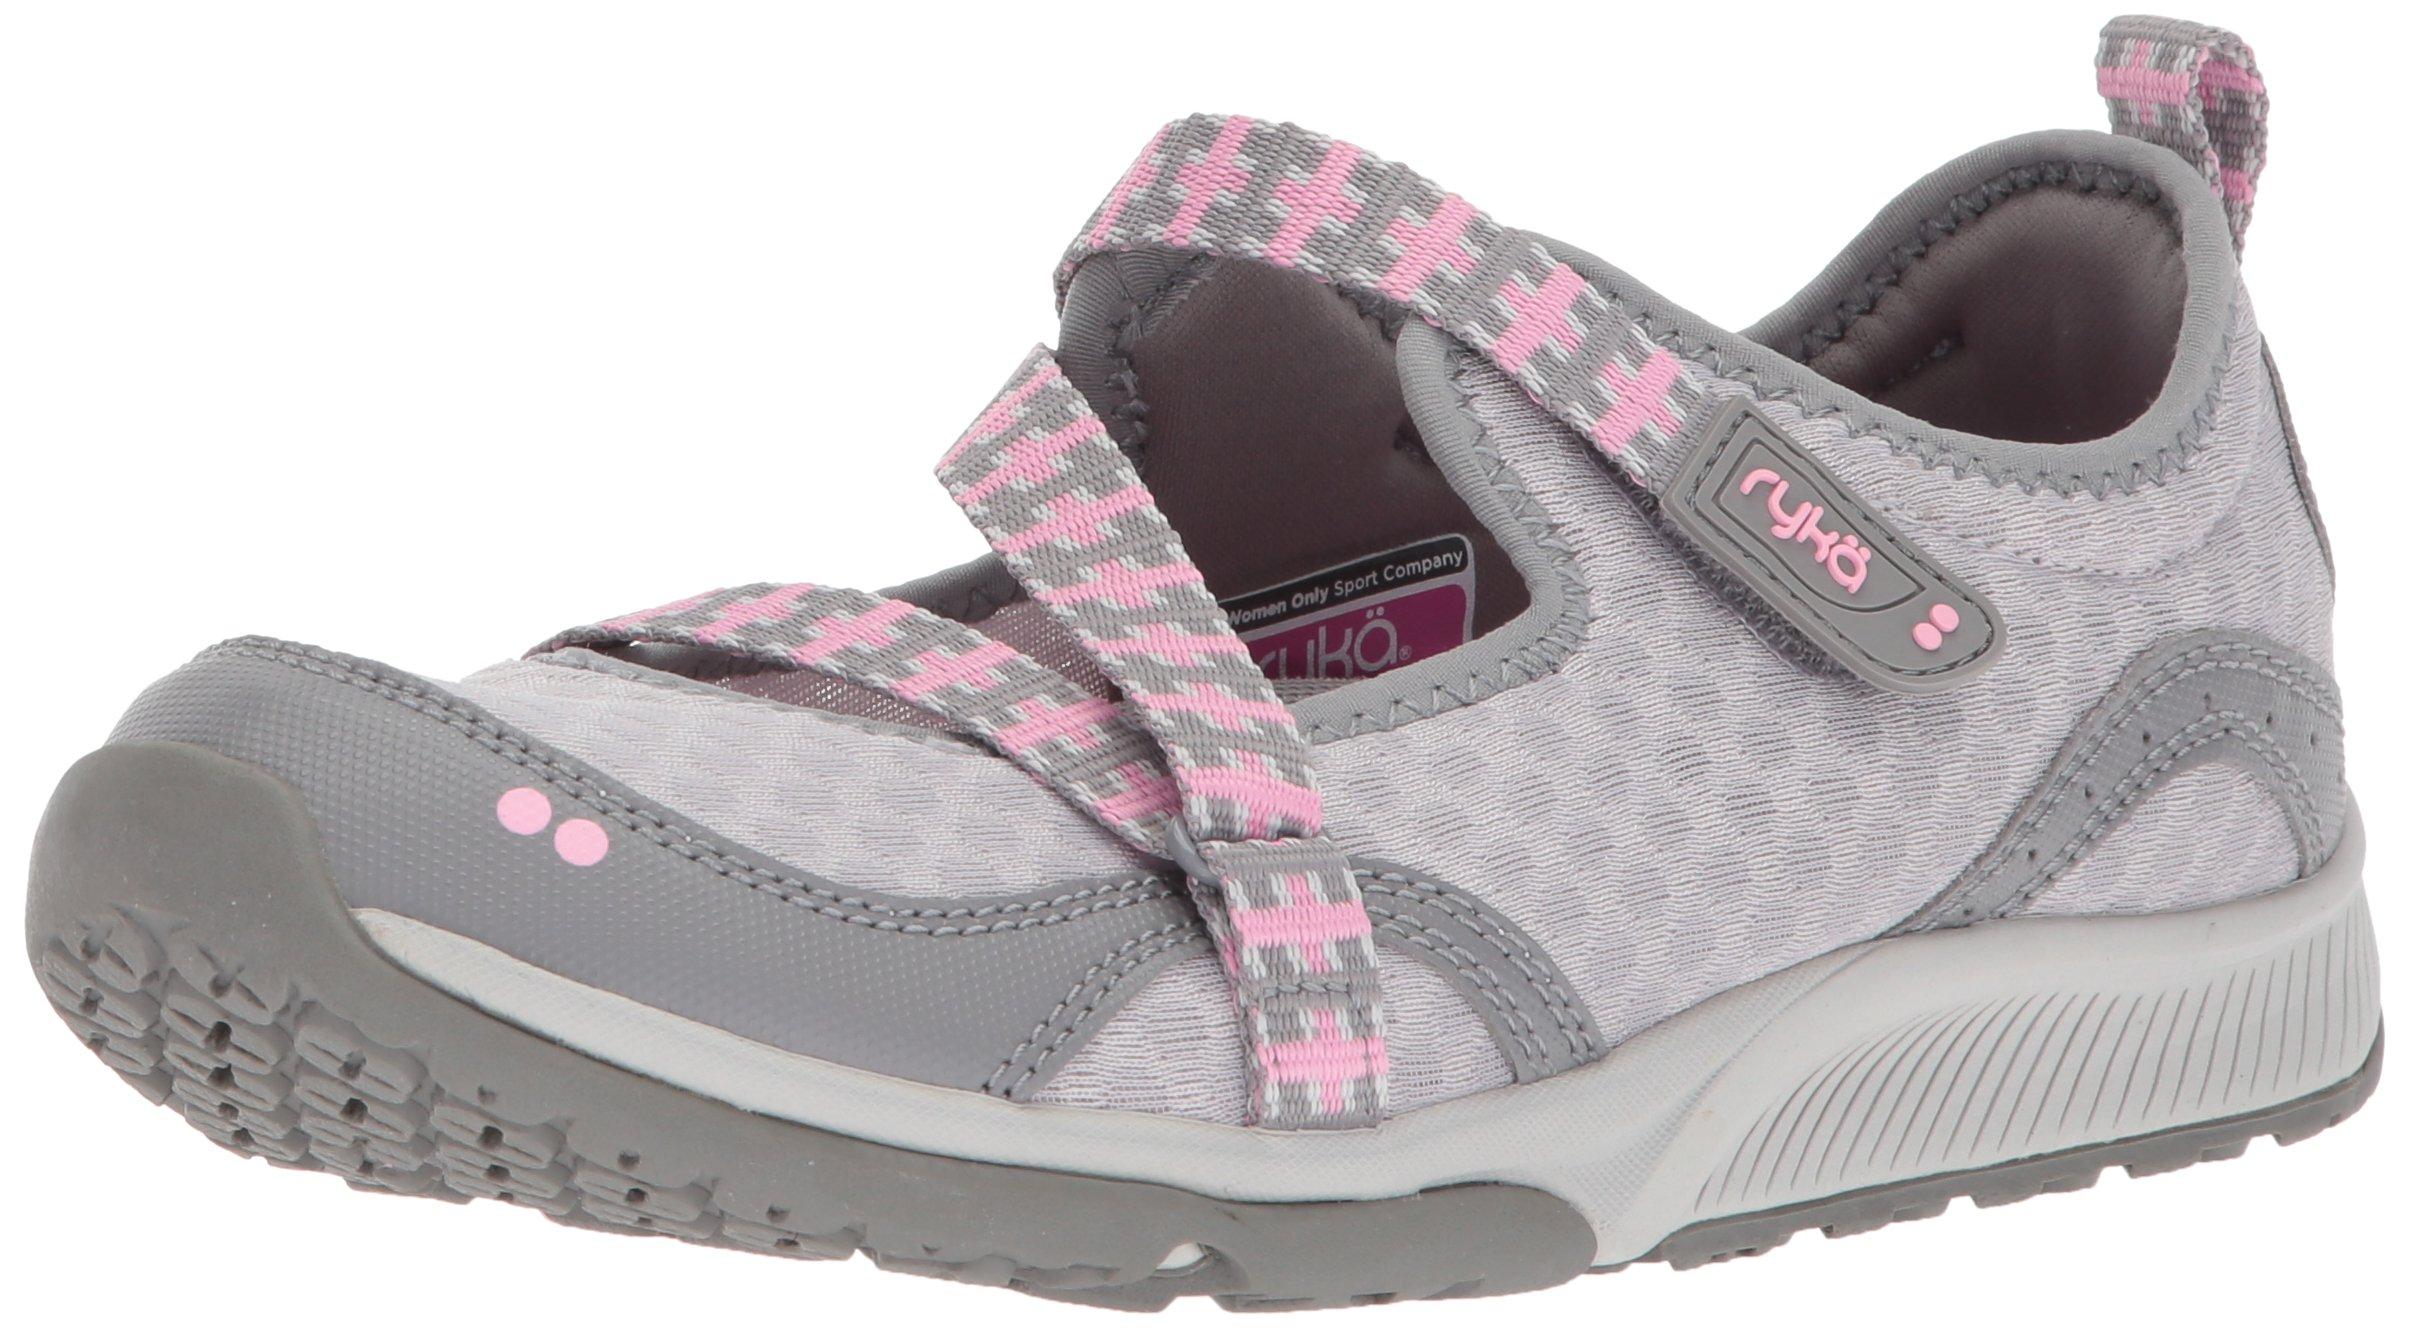 Ryka Women's Kailee Sneaker, Frost Grey/Cotton Candy/Summer Grey, 10 M US